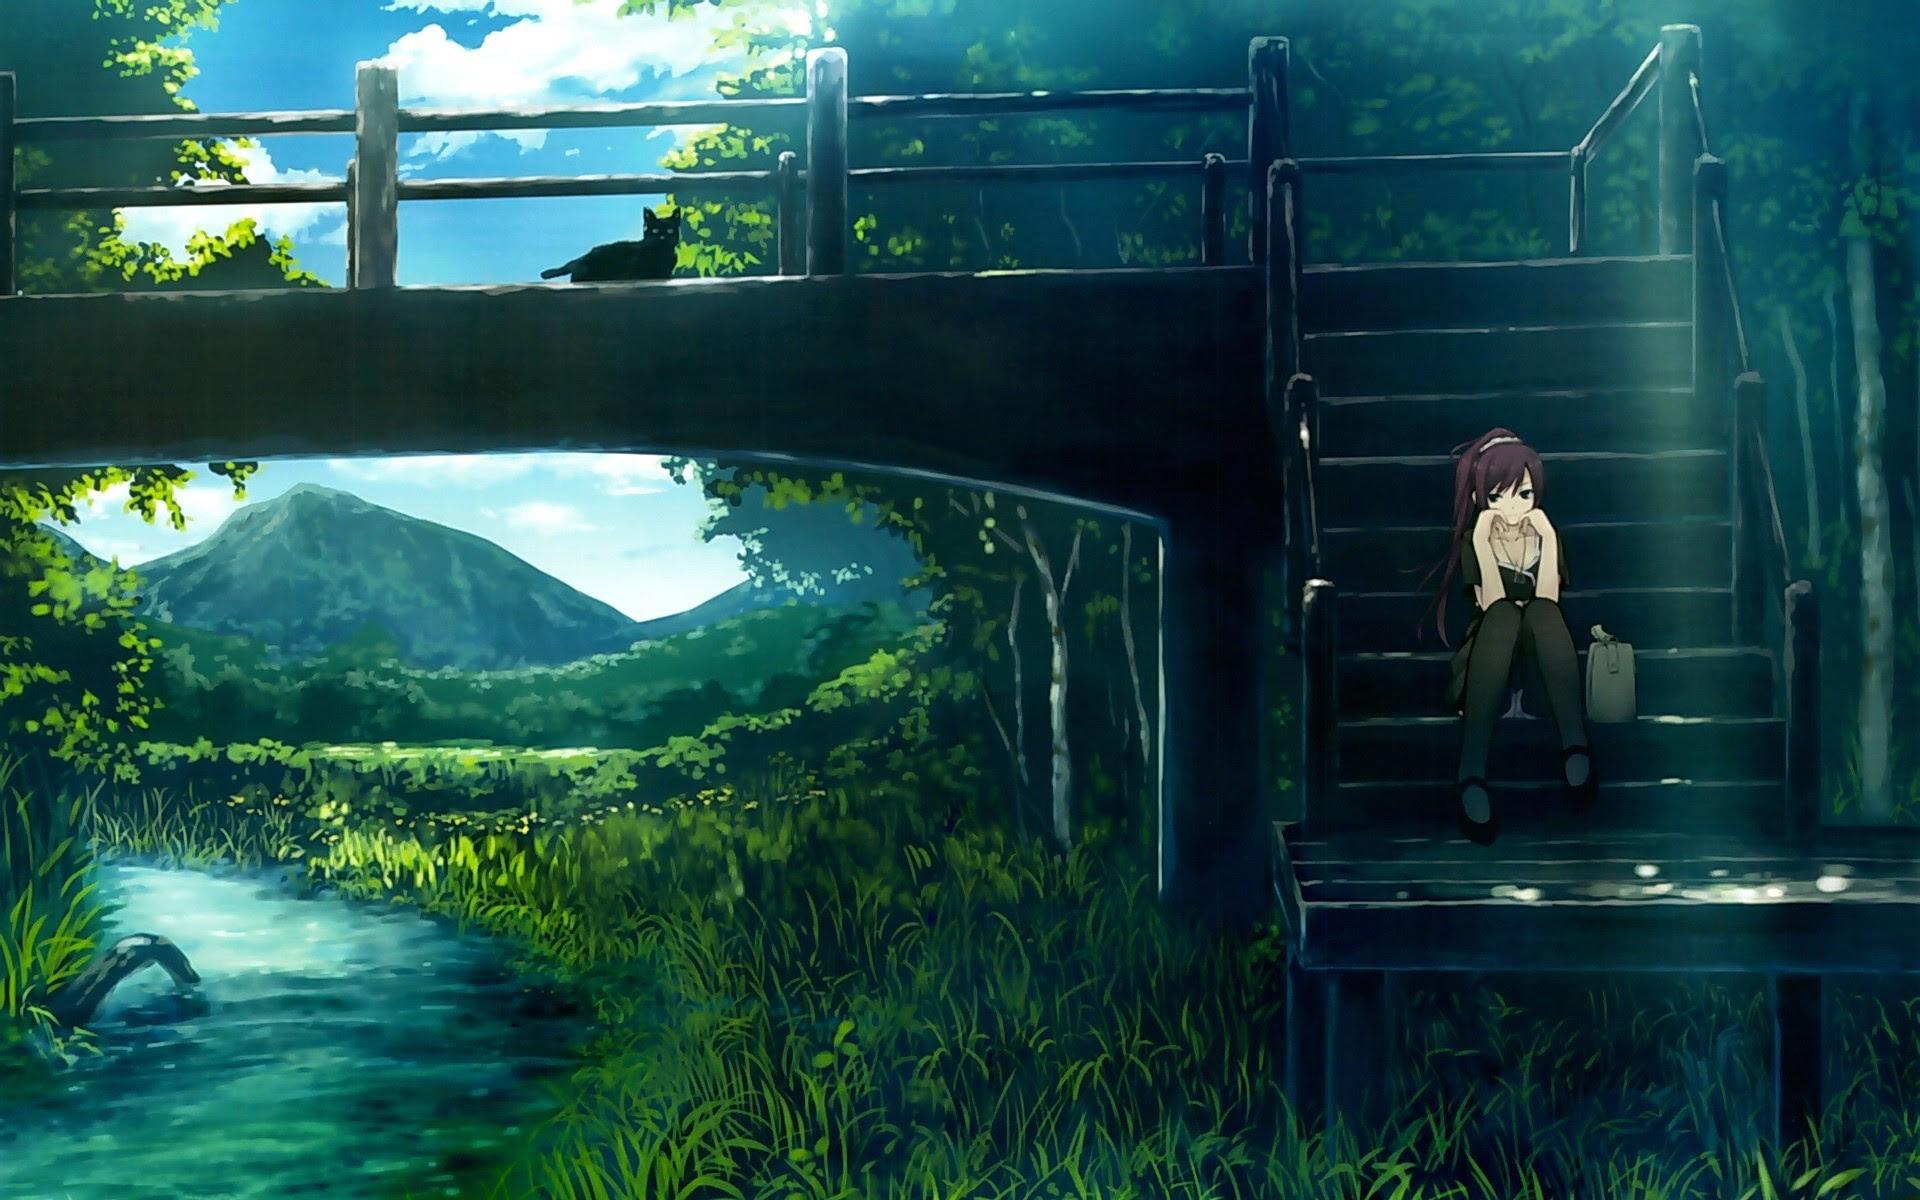 Unduh Kumpulan Wallpaper Alam Anime HD Gratis